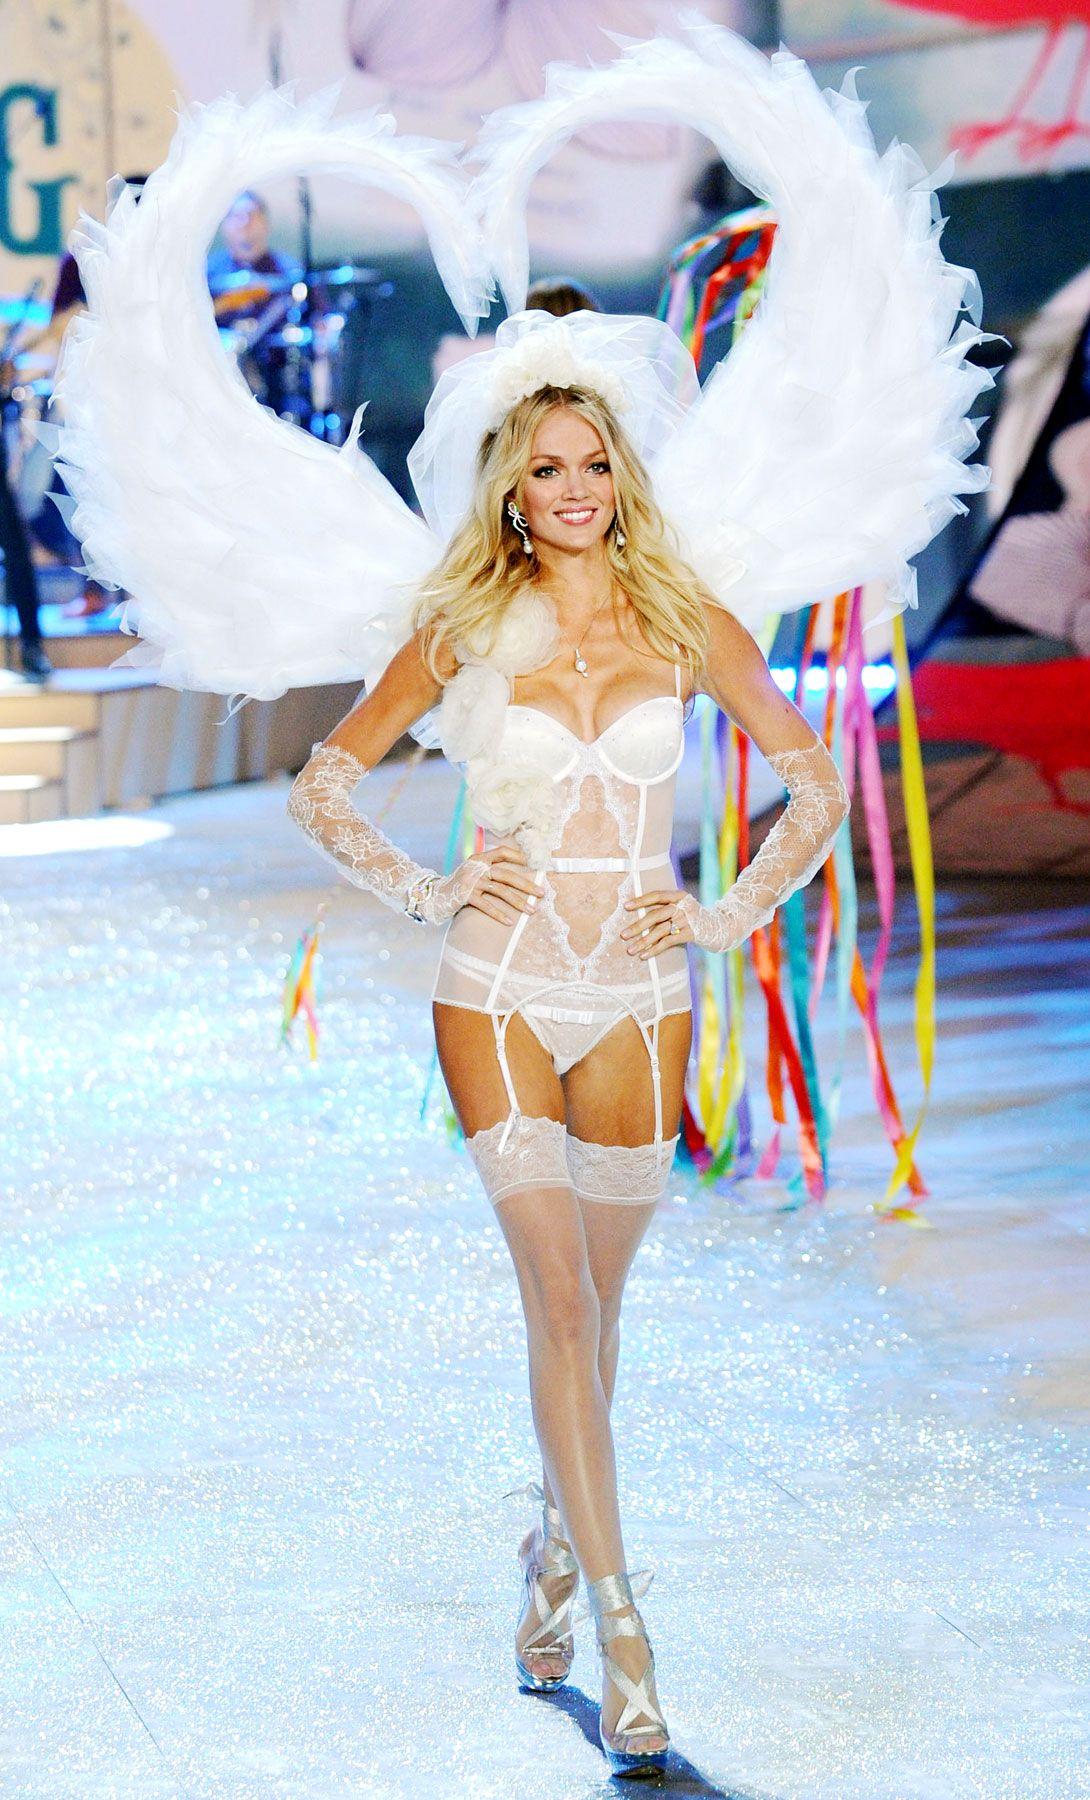 696dc5d071 An angel with heart wings. Victoria s Secret Fashion Show 2012  Lindsay  Ellingson